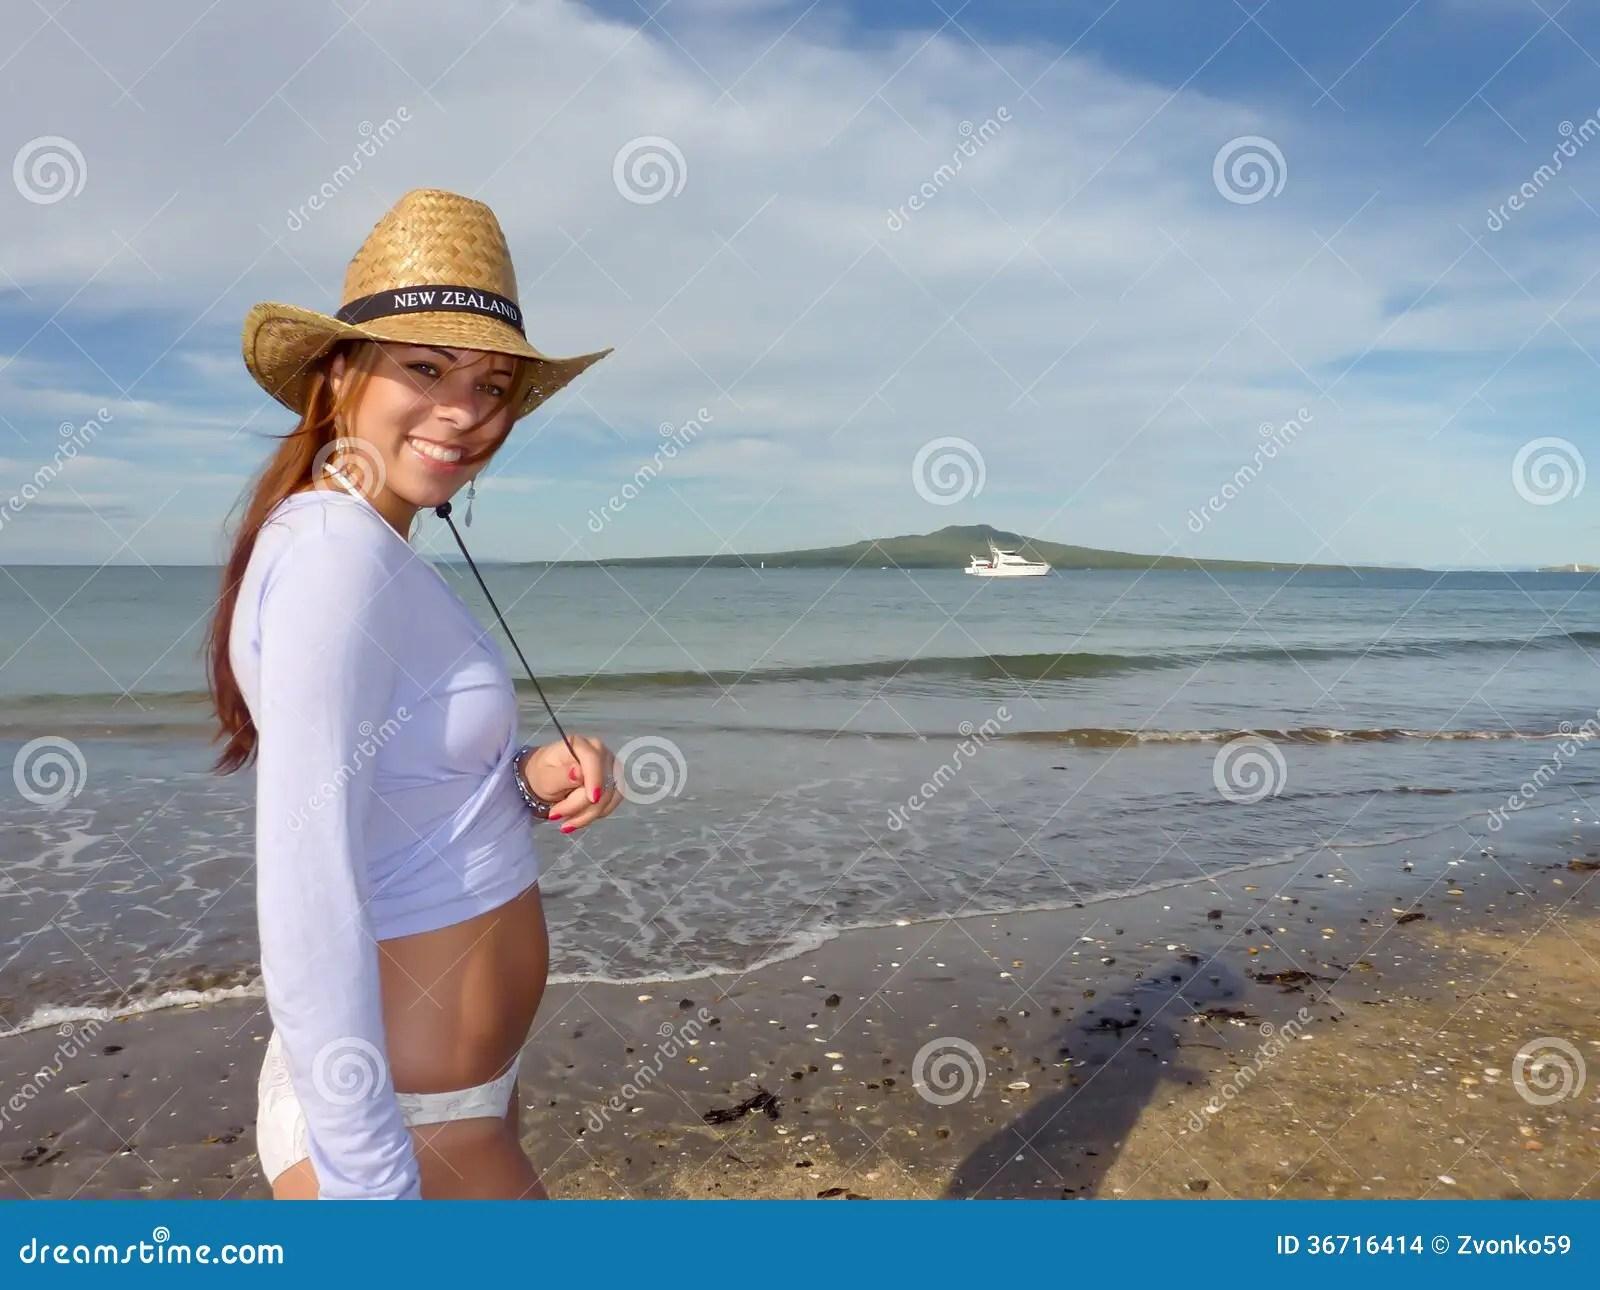 Smily New Zealand Girl Stock Images Image 36716414